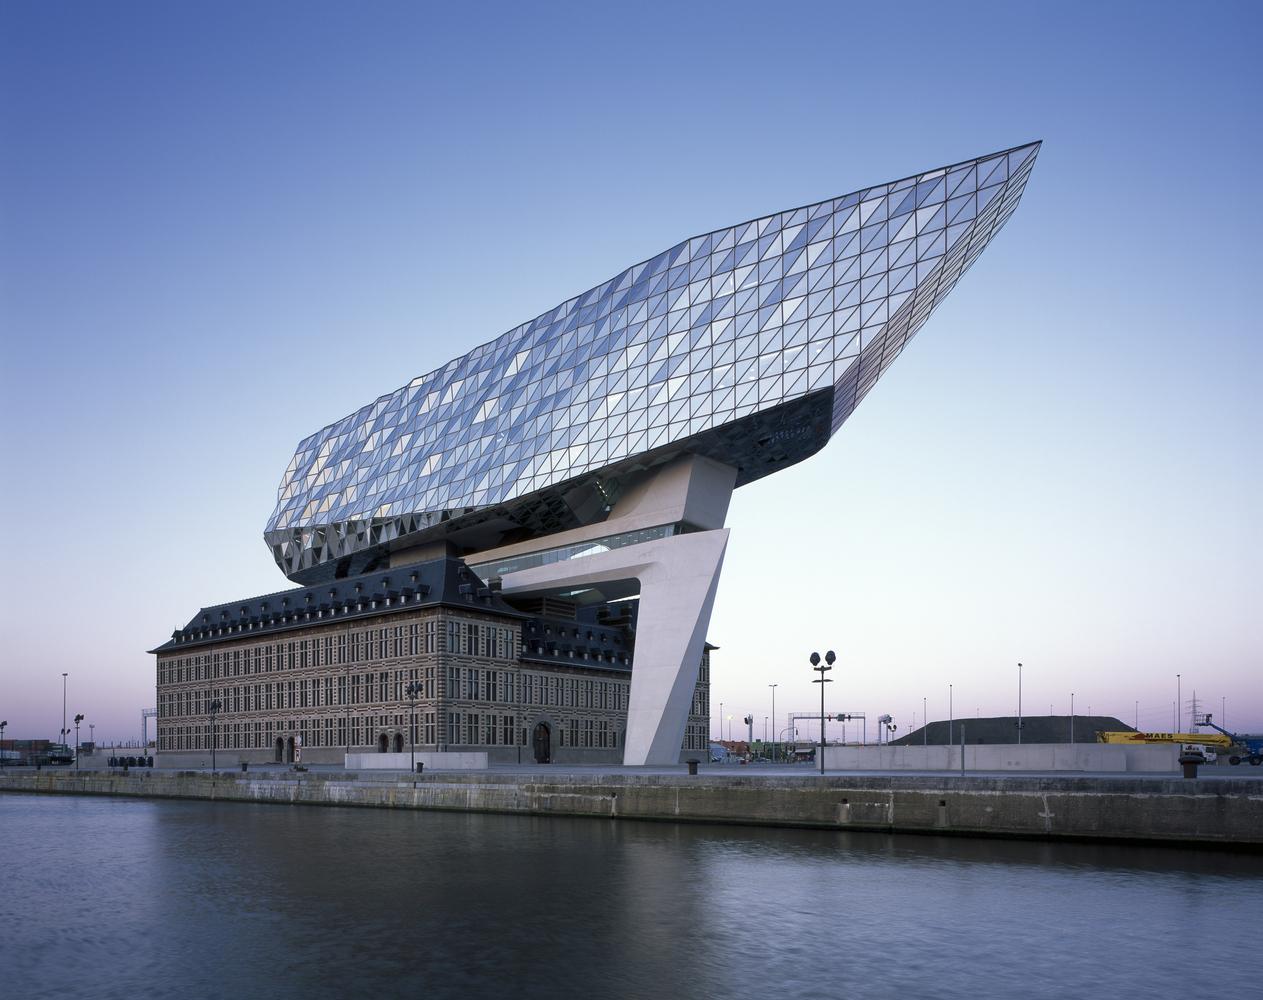 Antwerp Port House / Zaha Hadid Architects